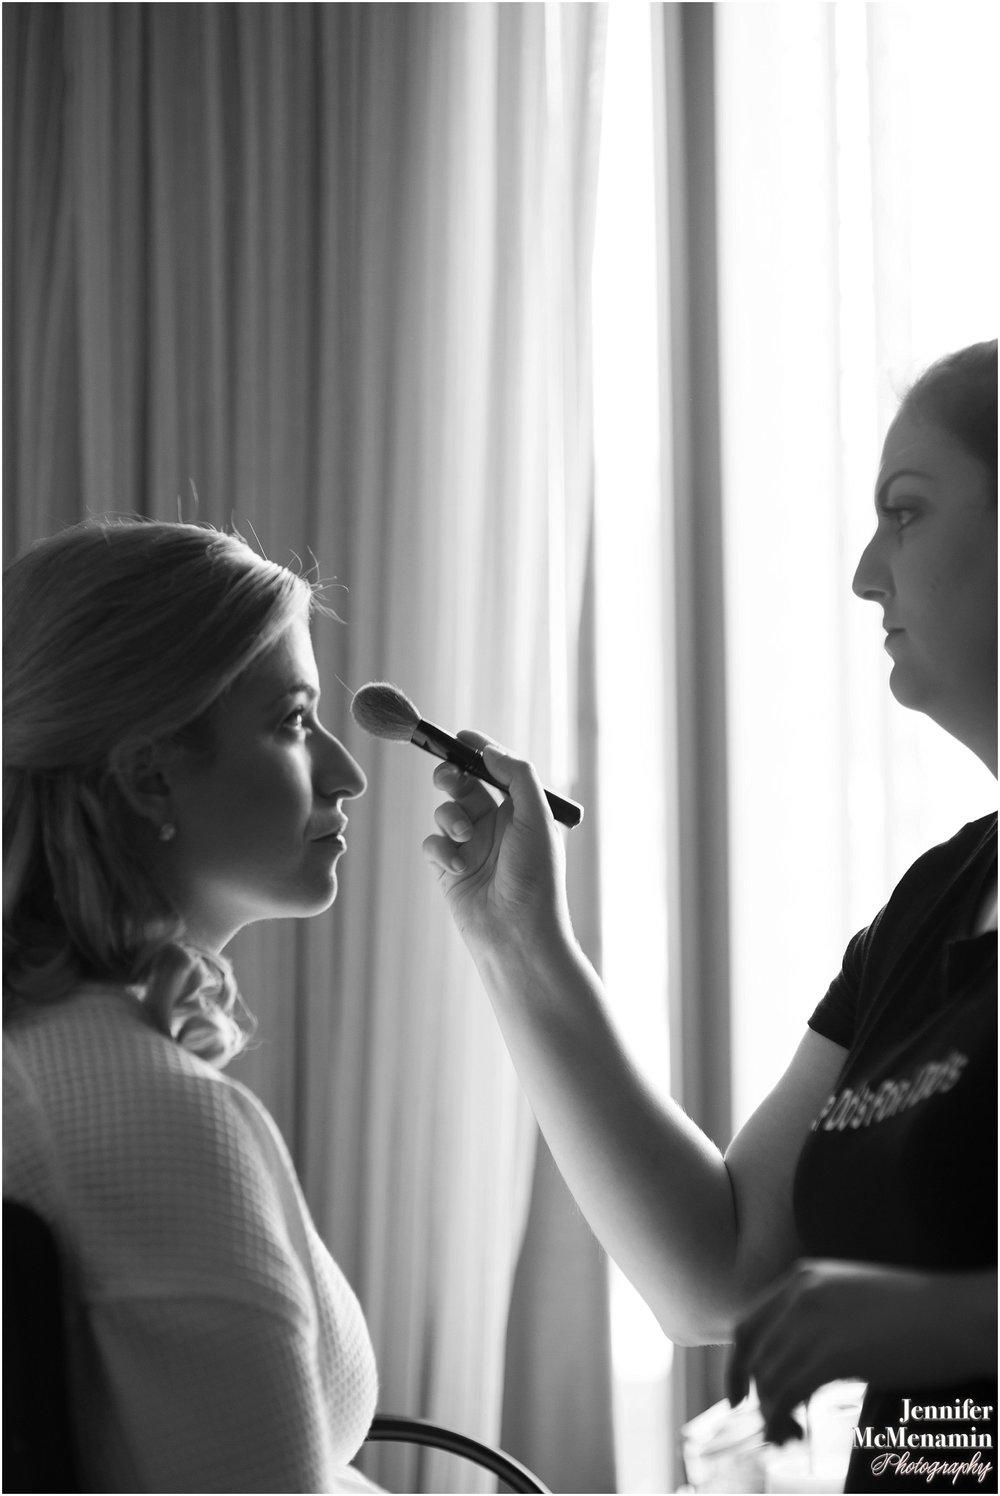 Courtney Framm AR BH _00220-00045_Jennifer-McMenamin-Photography-Royal-Sonesta-Harbor-Court-Hotel-wedding.jpg